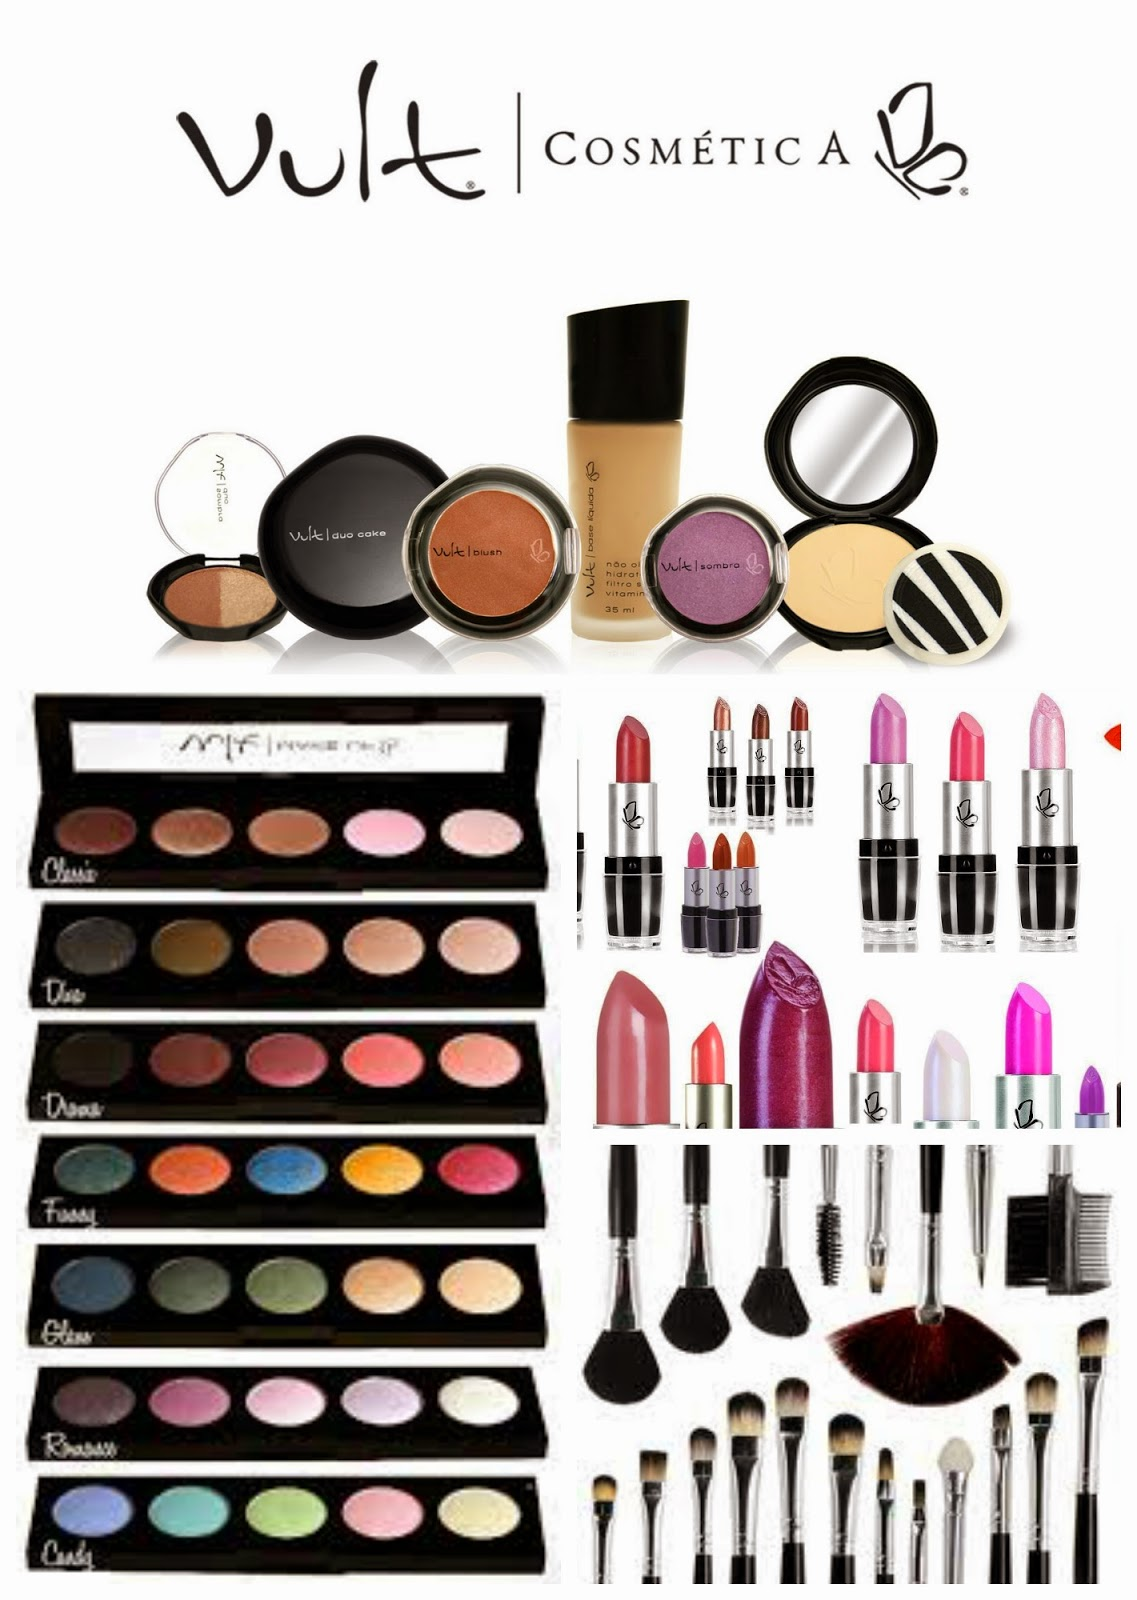 Marcas de maquillajes de brasil blog da pimpa - Marcas de sabanas buenas ...